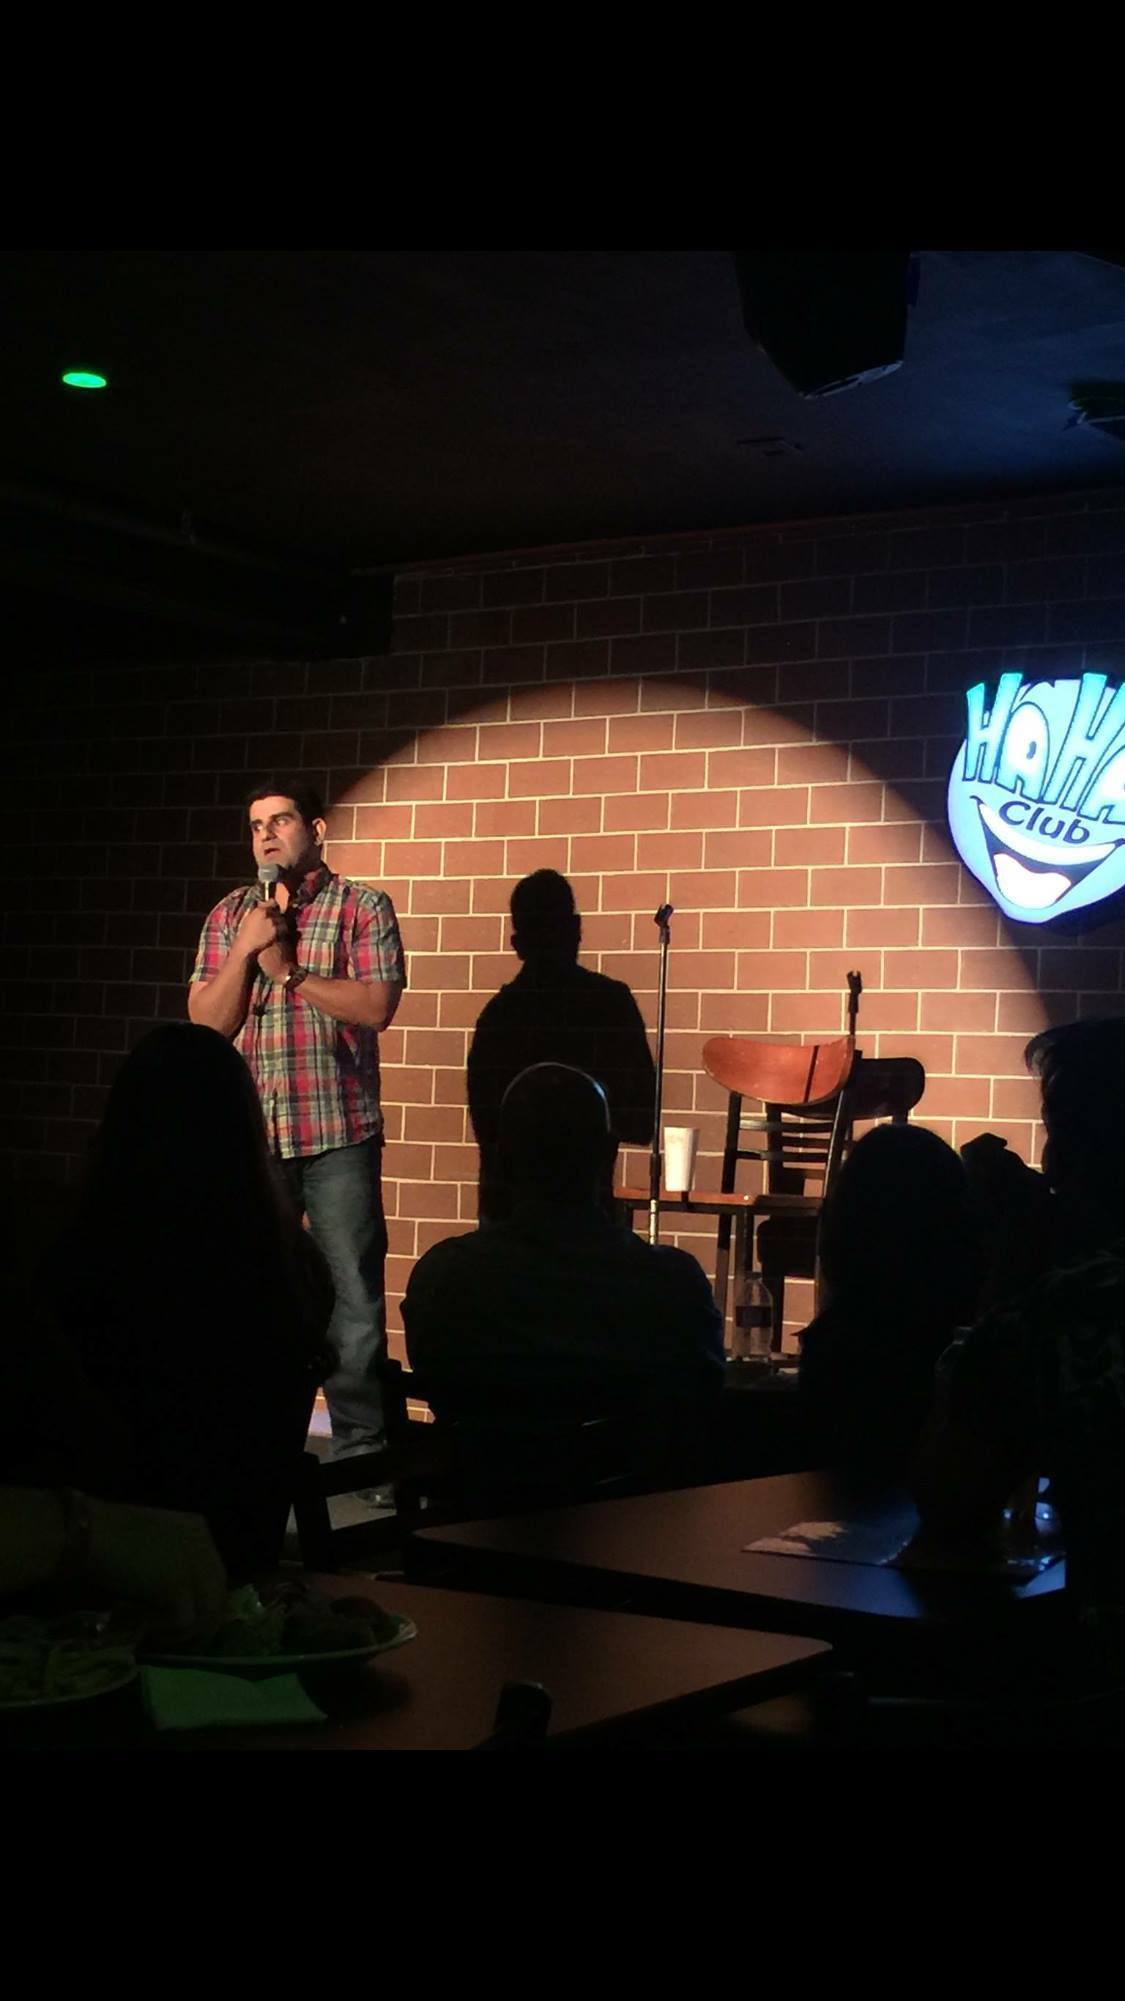 Ha Ha Cafe Comedy Club